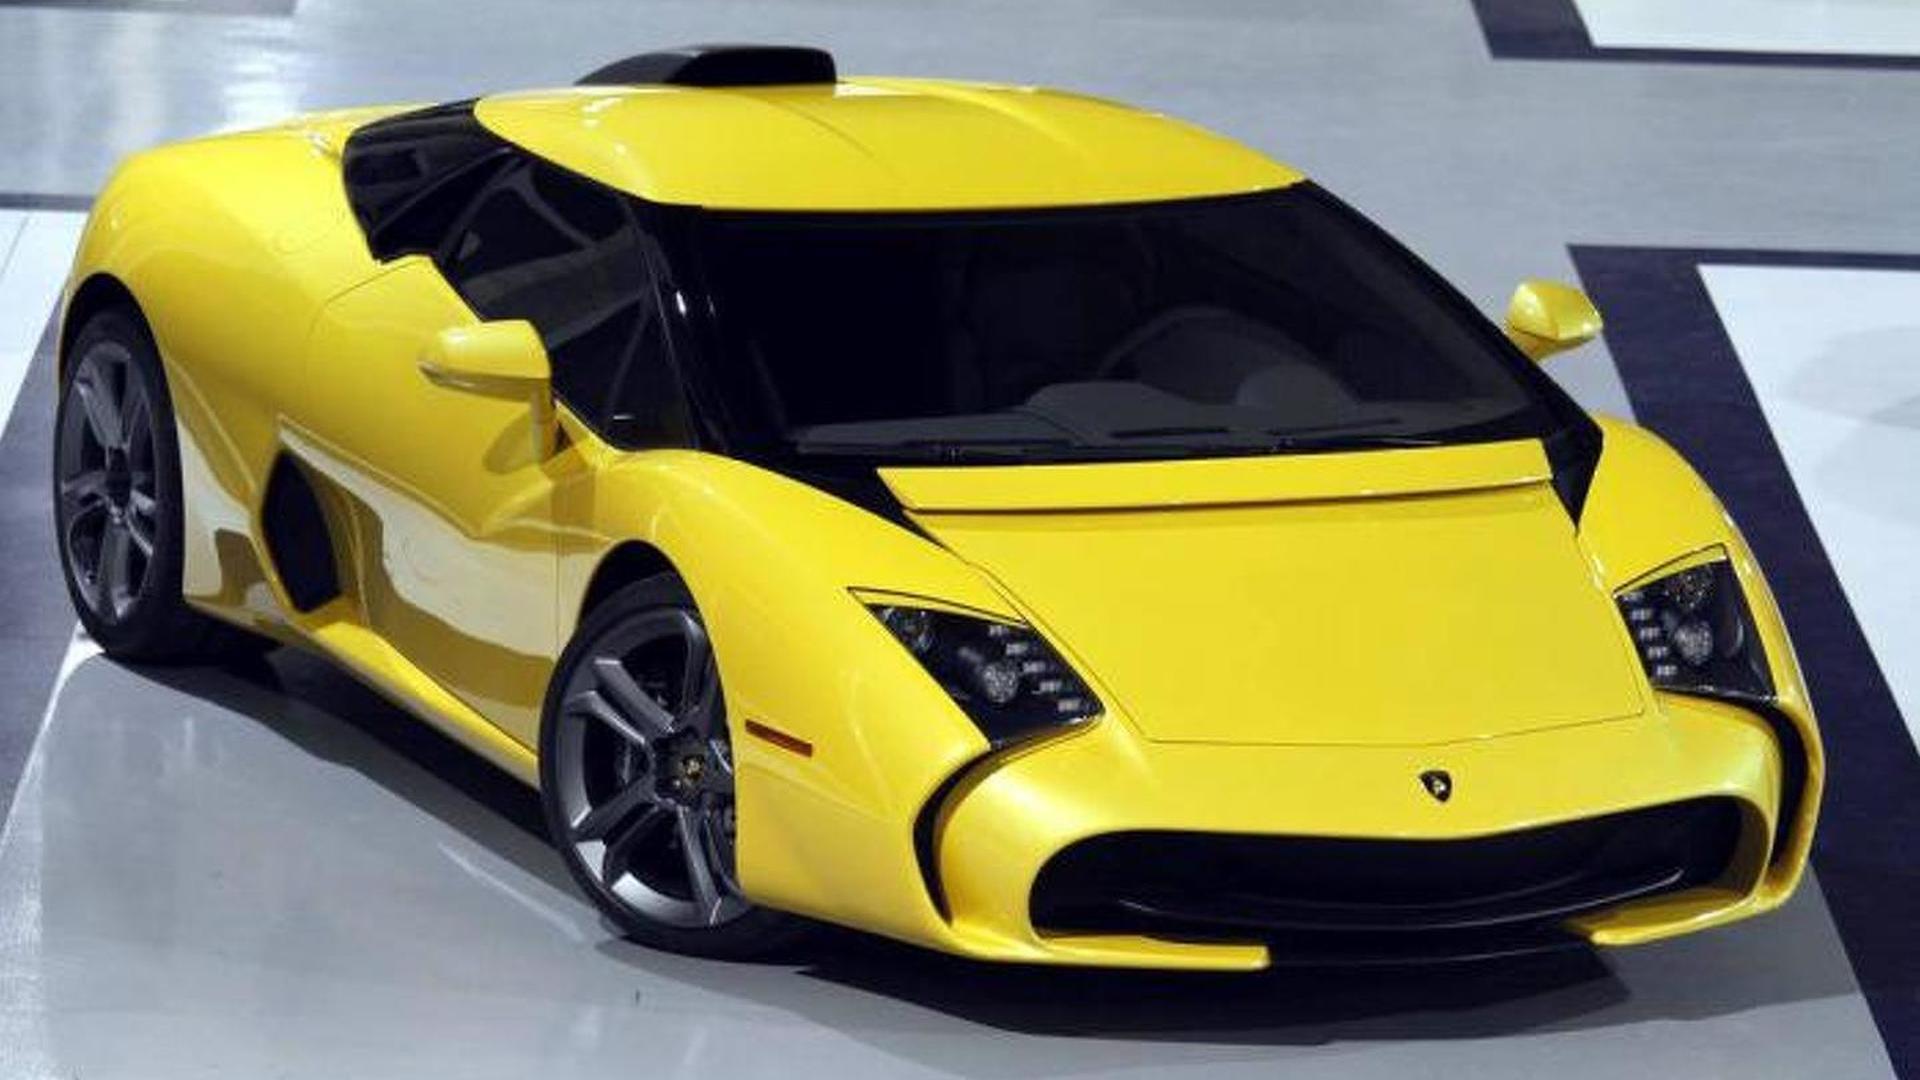 Lamborghini 5 95 Zagato With Pearl Yellow Paint Heading To Customer